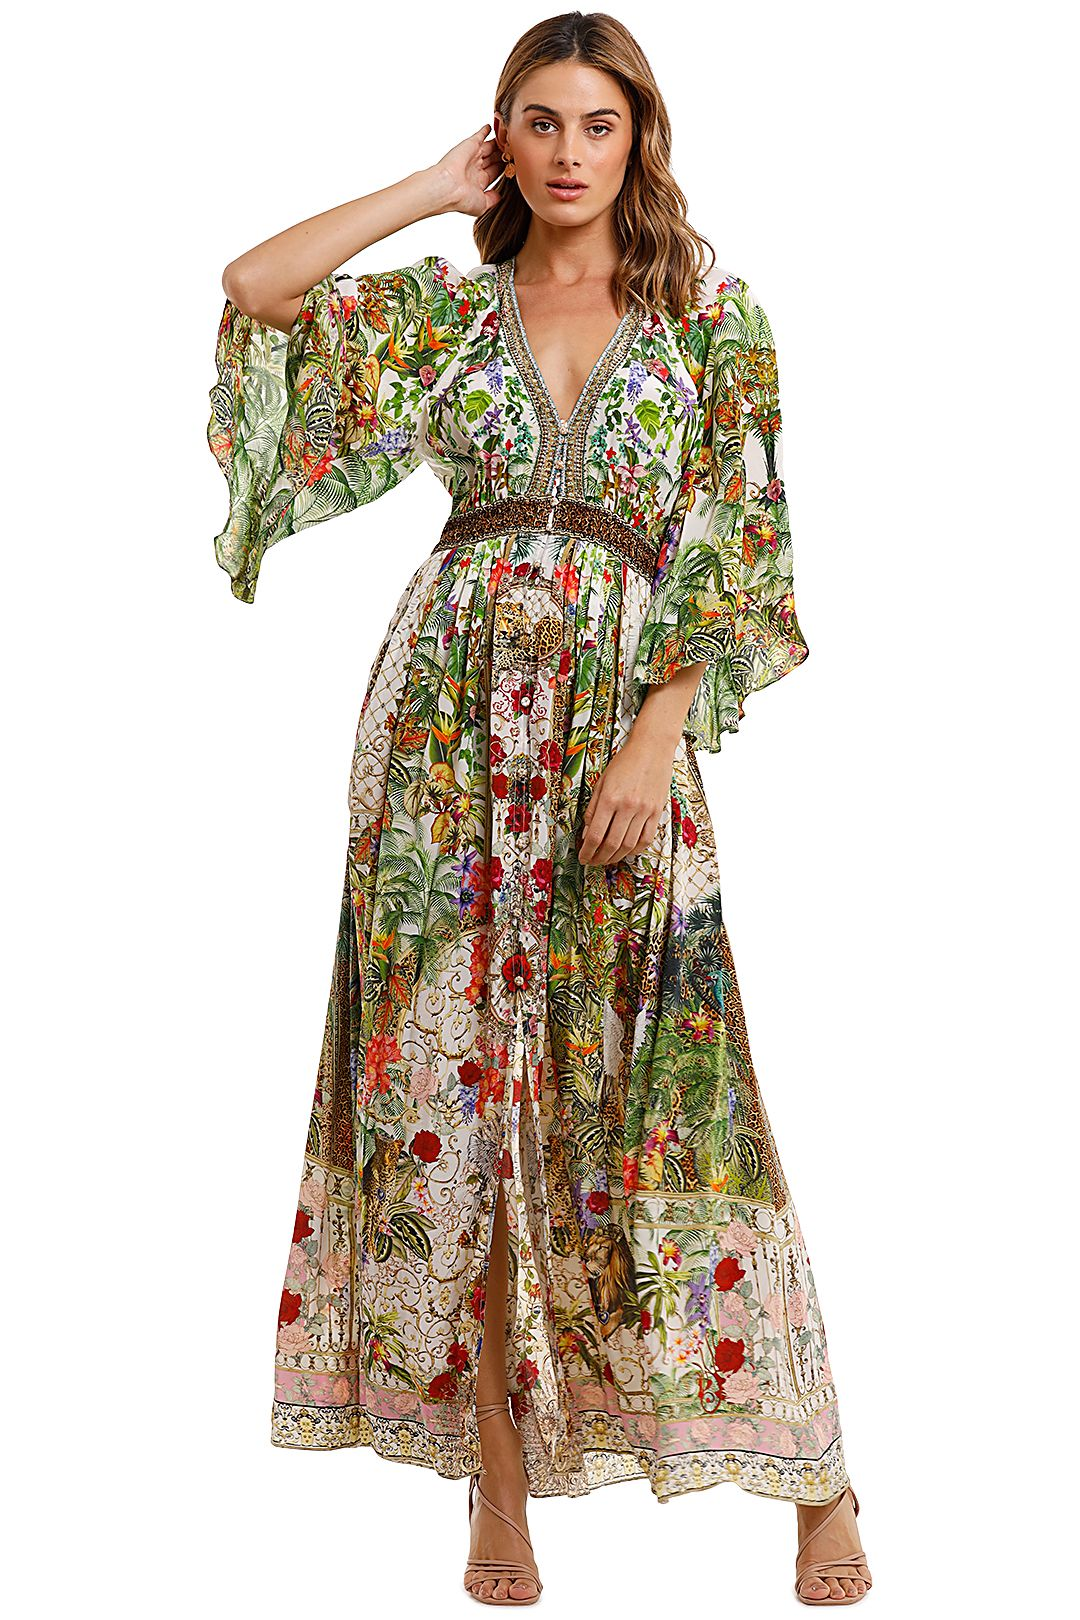 Camilla Long Dress With Smocked Waist Fair Verona